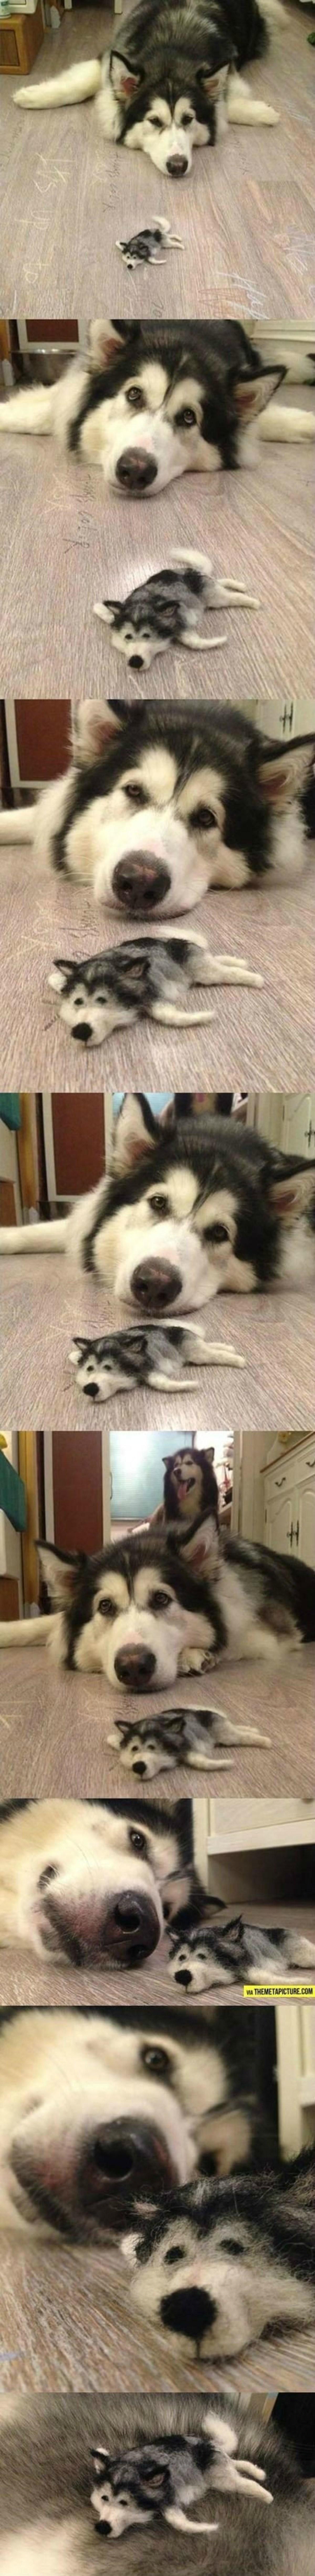 "Little doggo made from doggo hair. .. ""Don't pet me or my son ever again"" Little doggo made from hair ""Don't pet me or my son ever again"""